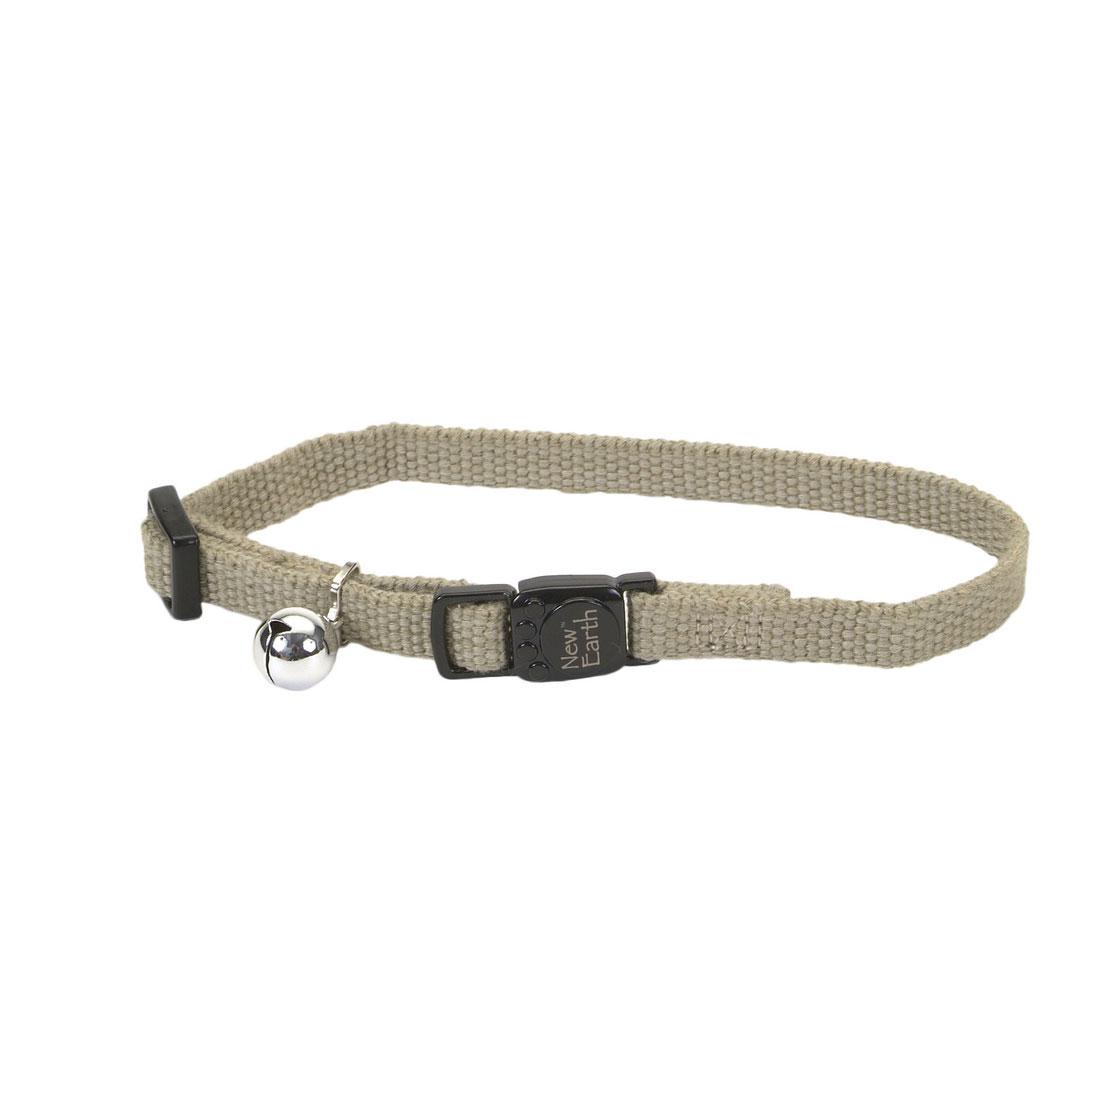 Coastal Pet New Earth Soy Adjustable Breakaway Cat Collar, Olive, 8-12-in